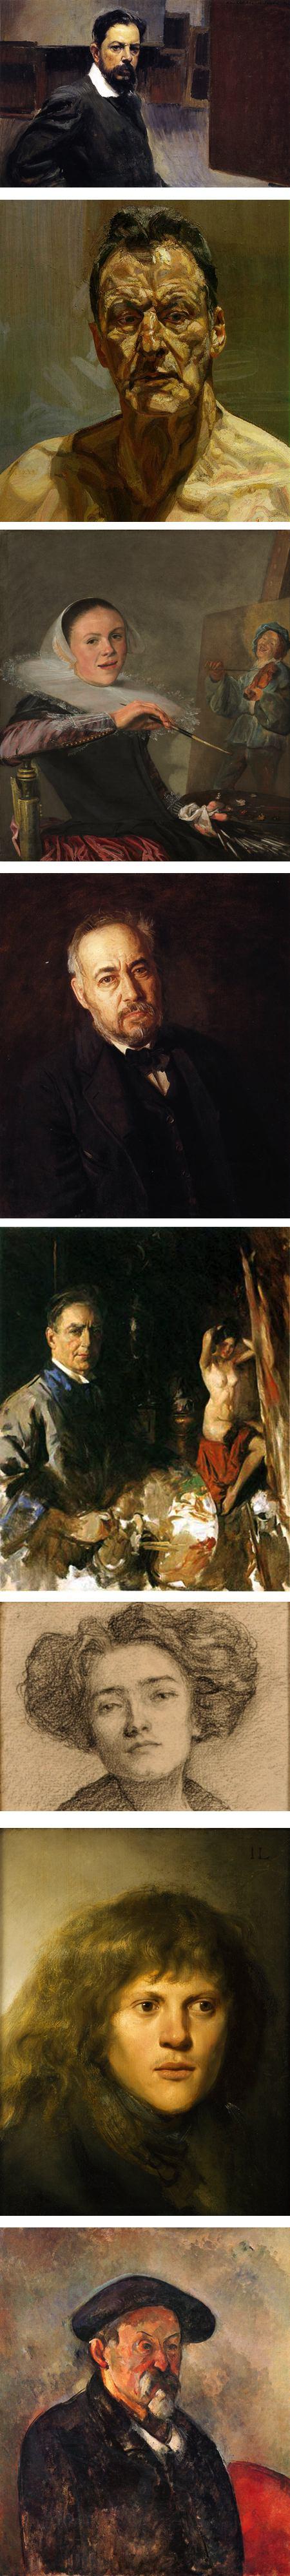 Joaquin Sorolla y Bastida, Lucian Freud, Judith Leyster, Thomas Eakins, Howard Chandler Christy,  Ila Schutz,  Jan Lievens, Paul Cezanne